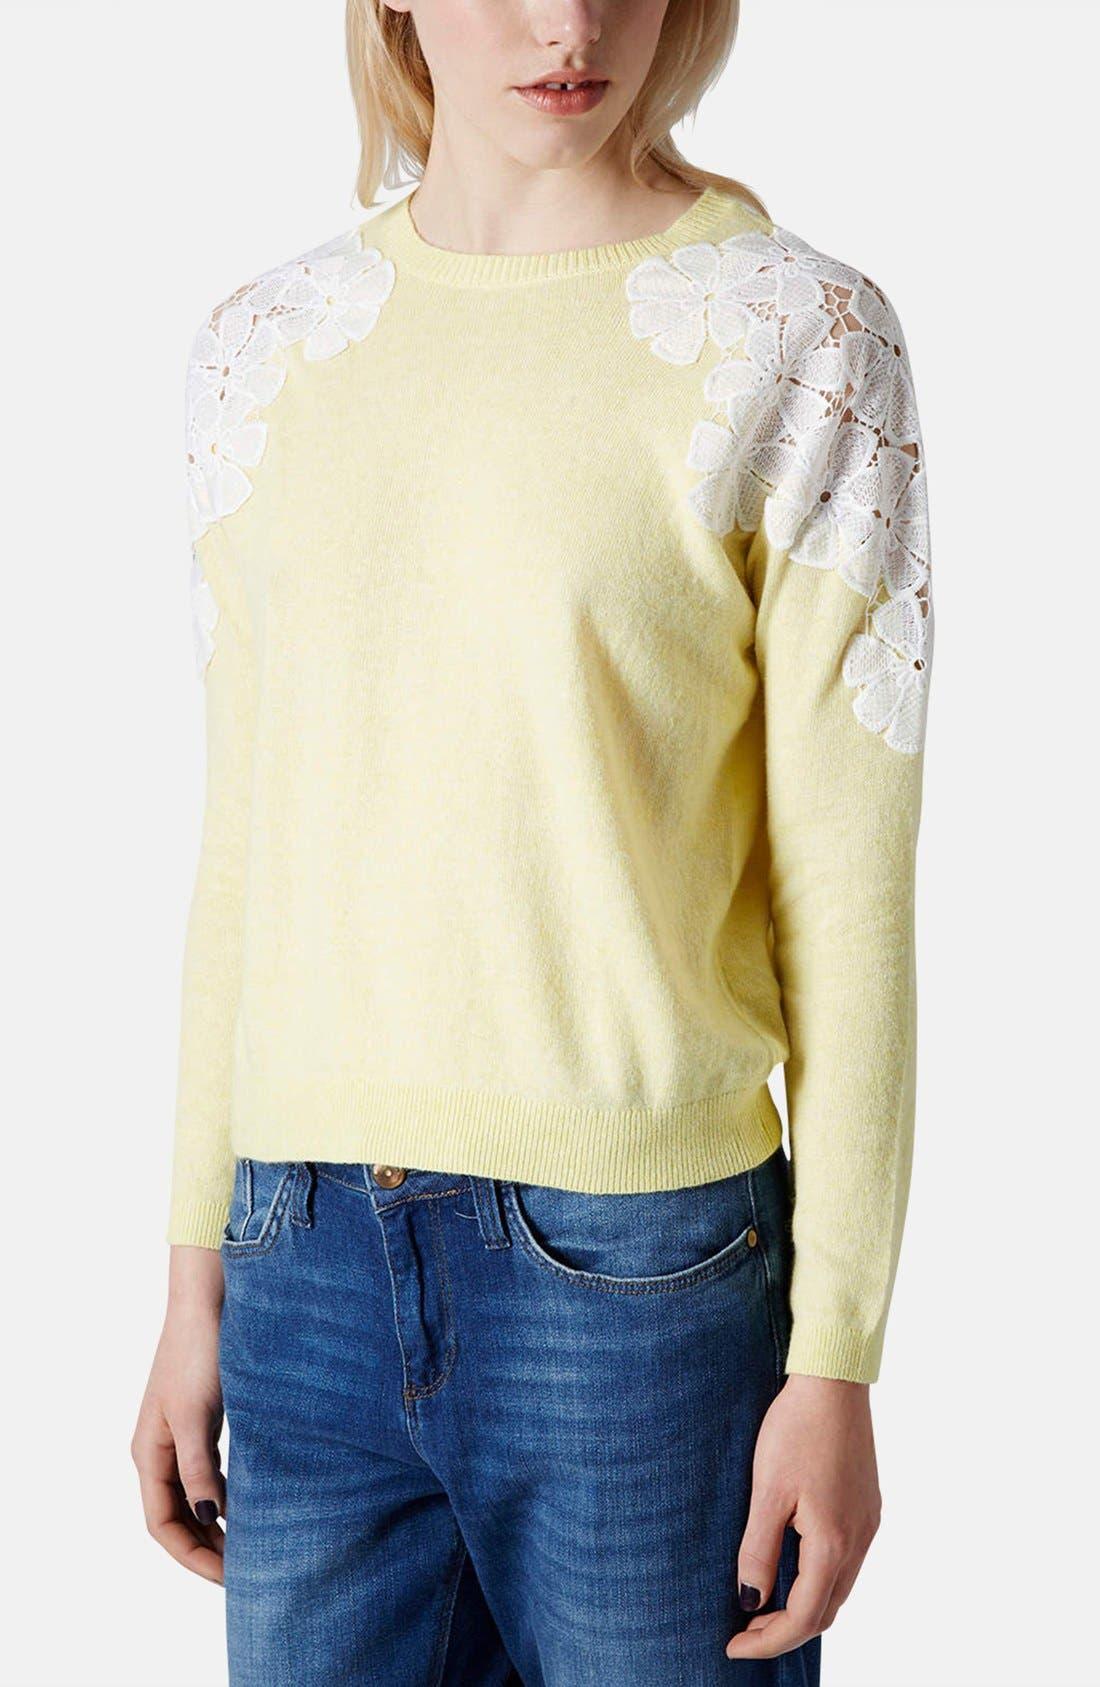 Main Image - Topshop Embroidered Shoulder Knit Sweater